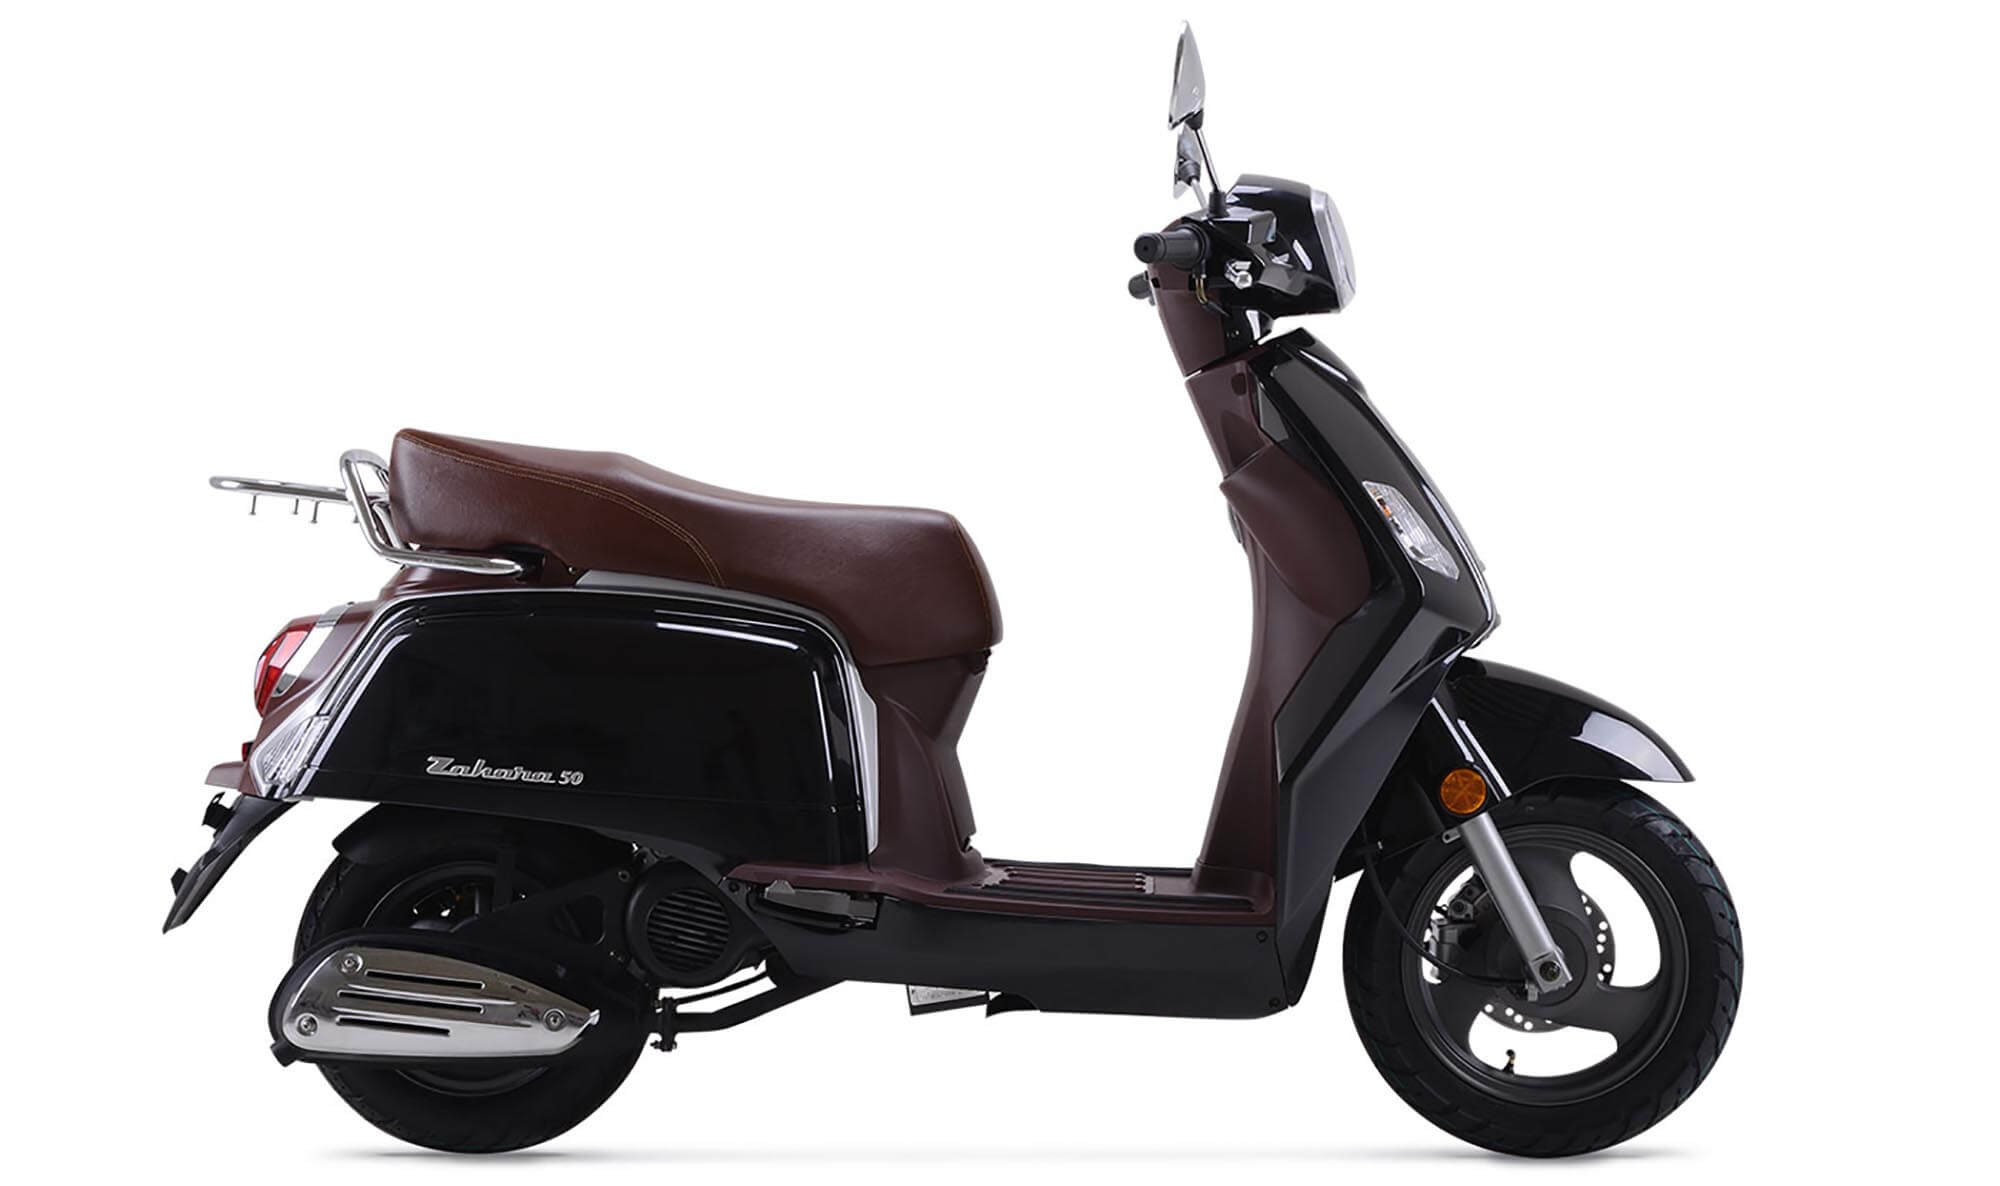 comprar-motos-keeway-zahara-negro-motissimo-barcelona